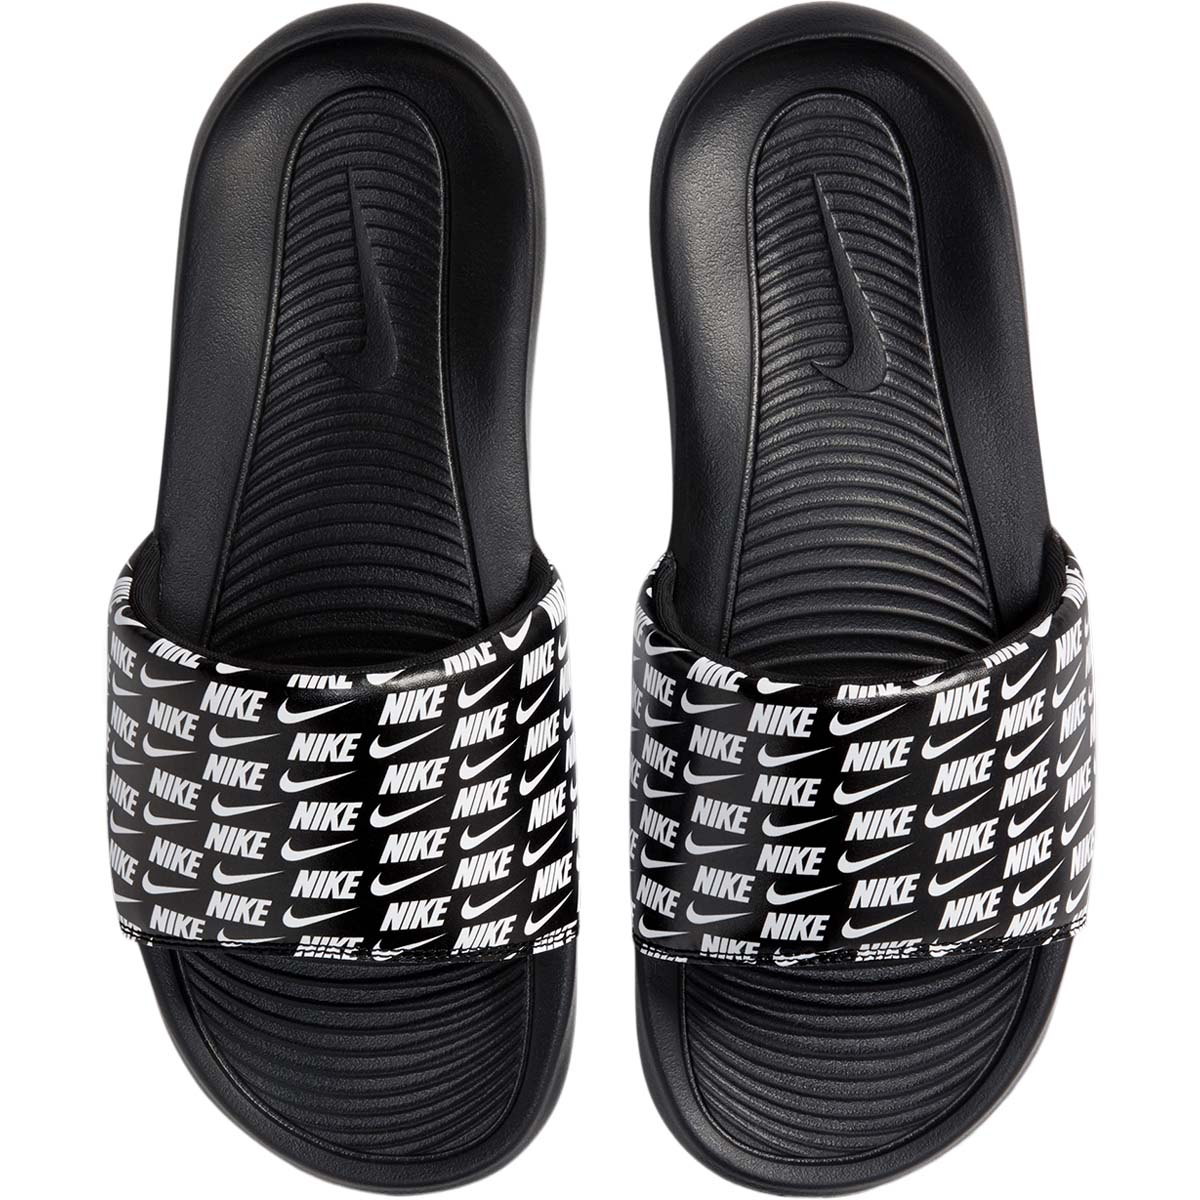 Nike Victori One Printed Slide Badesandaler Herre